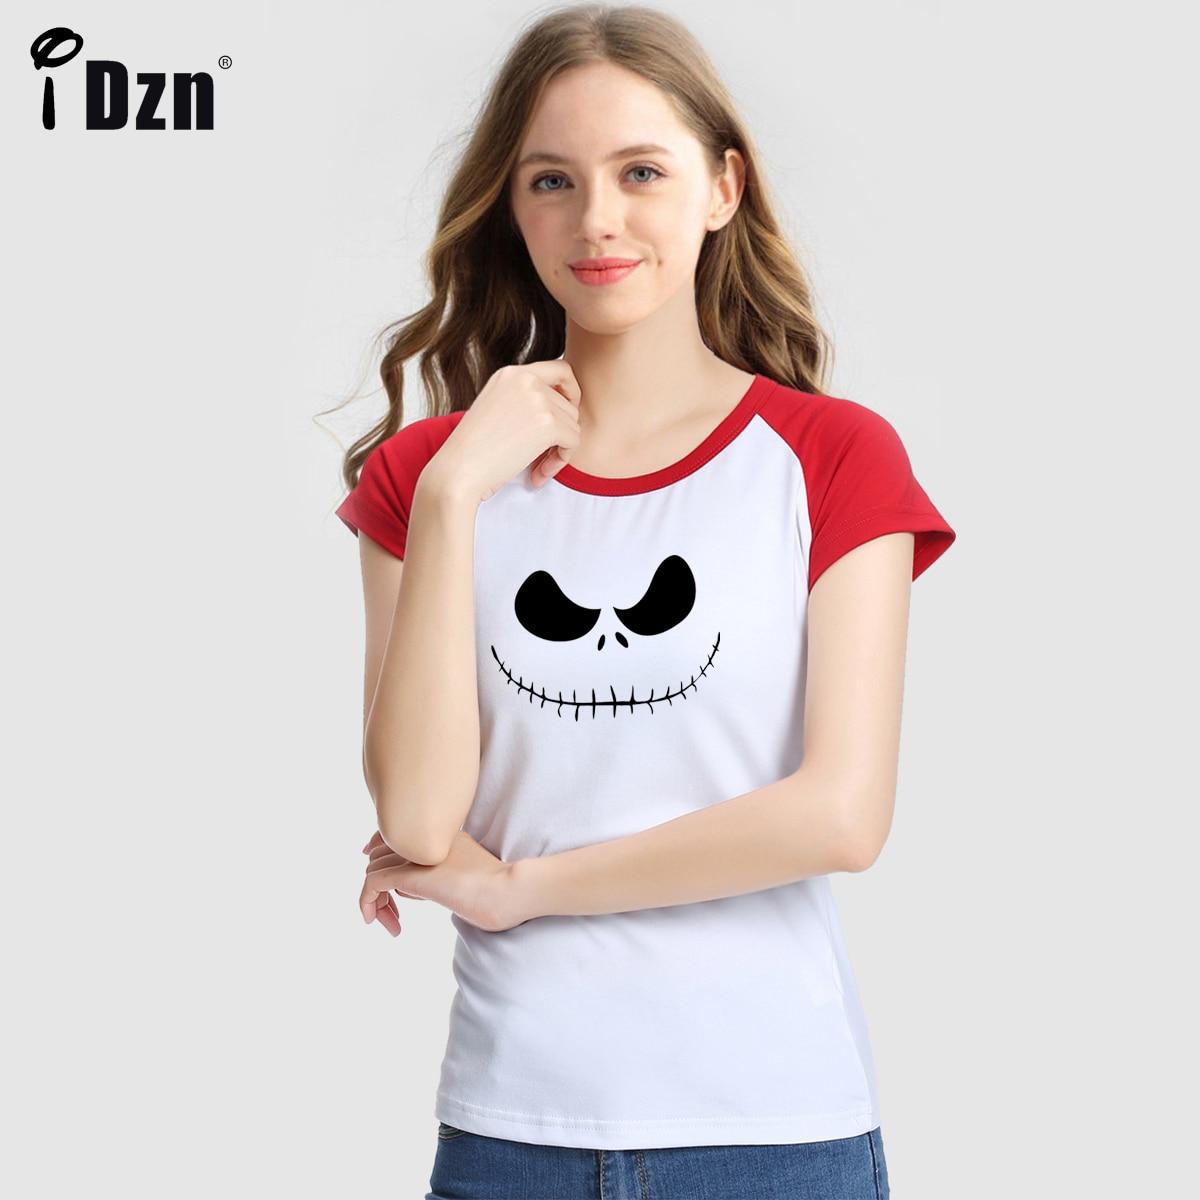 Summer Women T-shirt Rat Mouse Skull Cowboy Style The Nightmare Before Christmas Jack Skellington Short Sleeve Printed Tees Tops